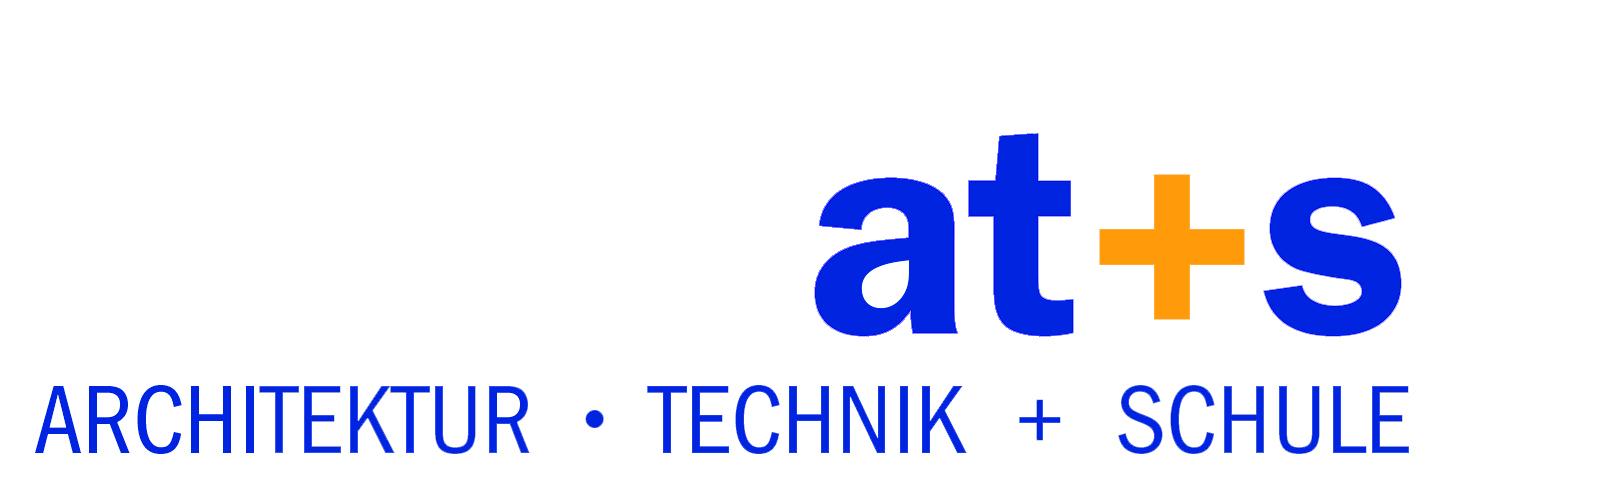 architektur_Technik_ schule_farbig_final_kurz-2